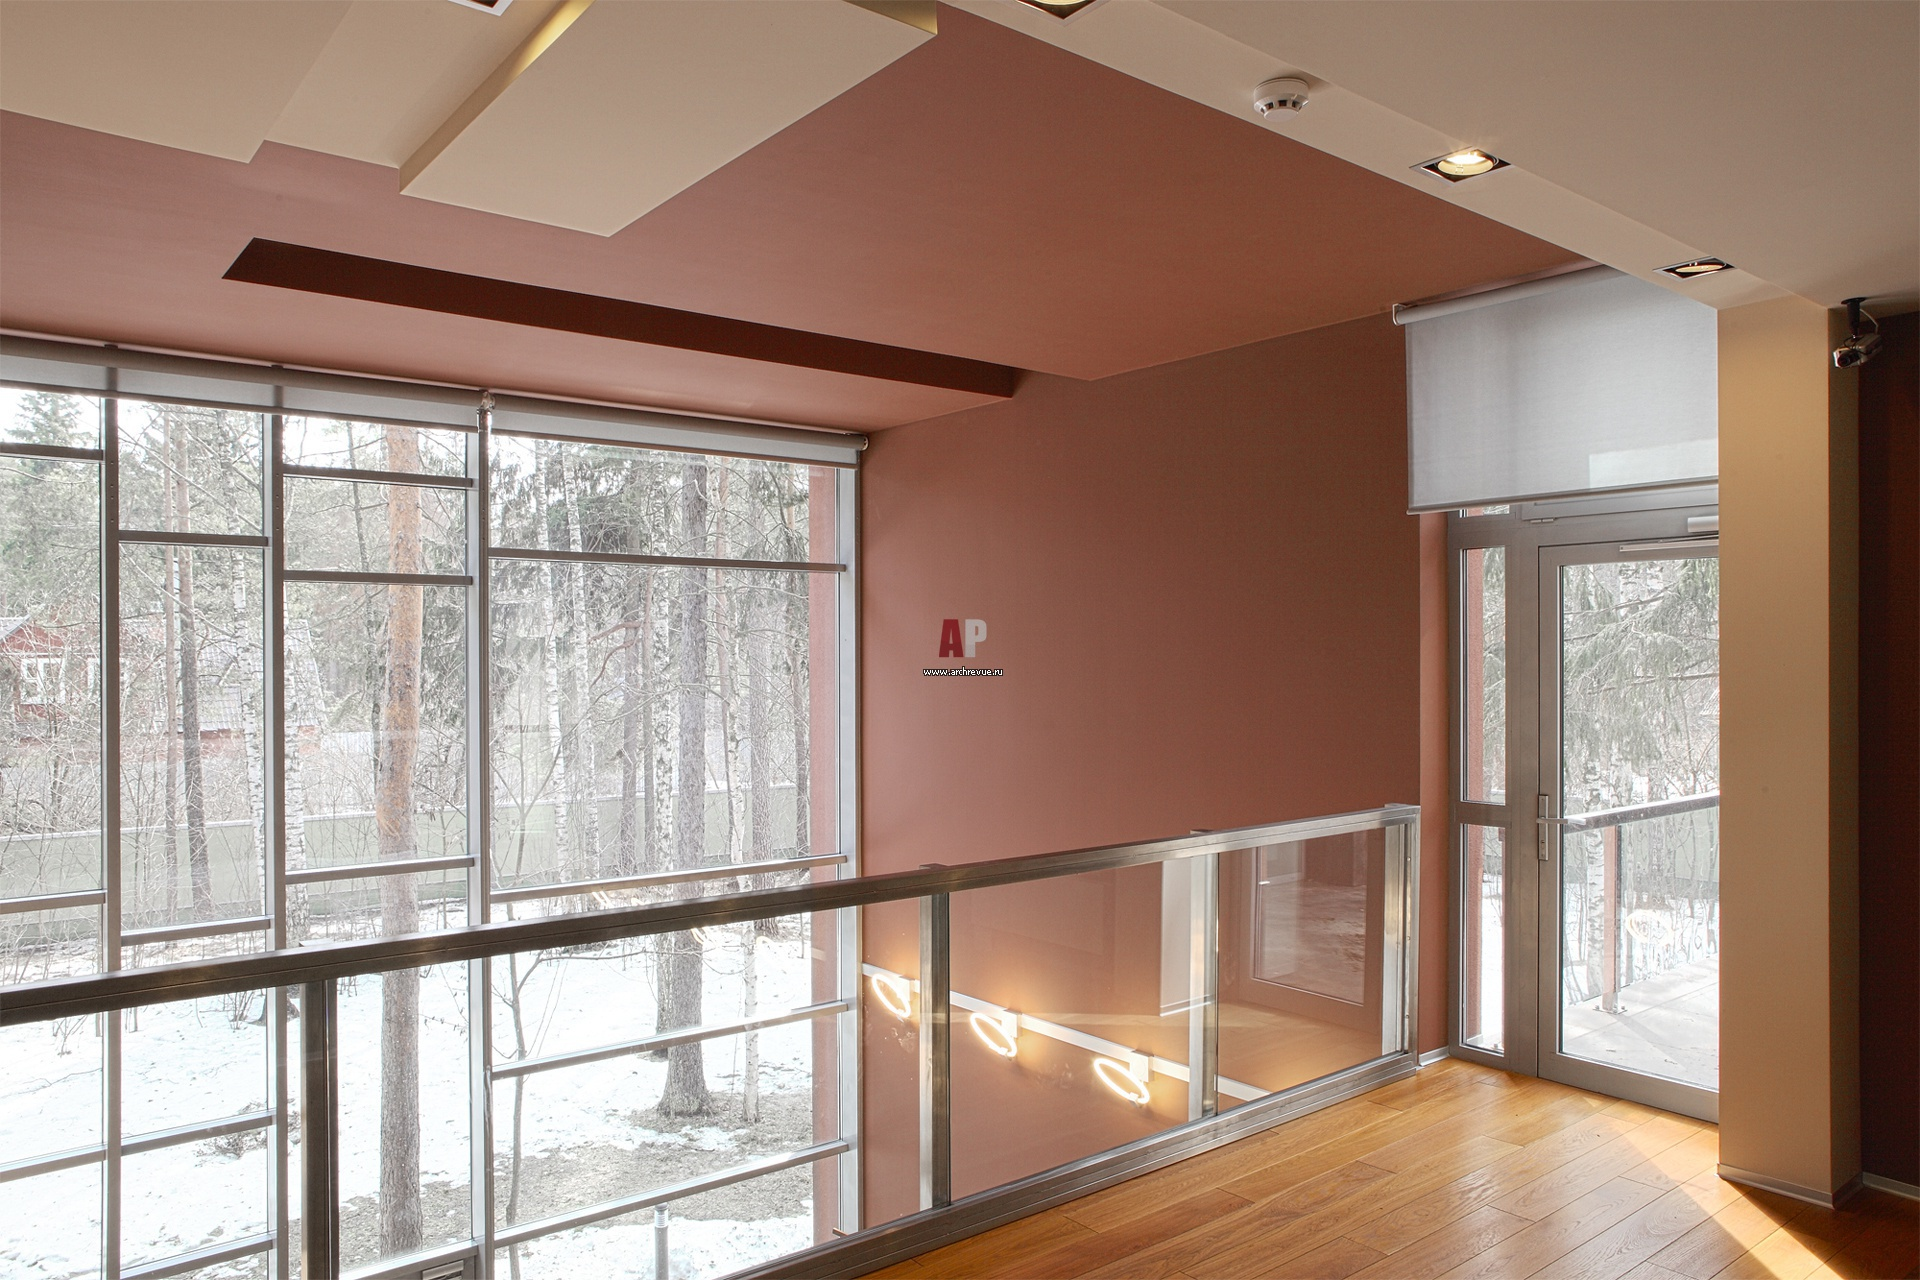 Фото интерьера балкона дома в стиле минимализм.